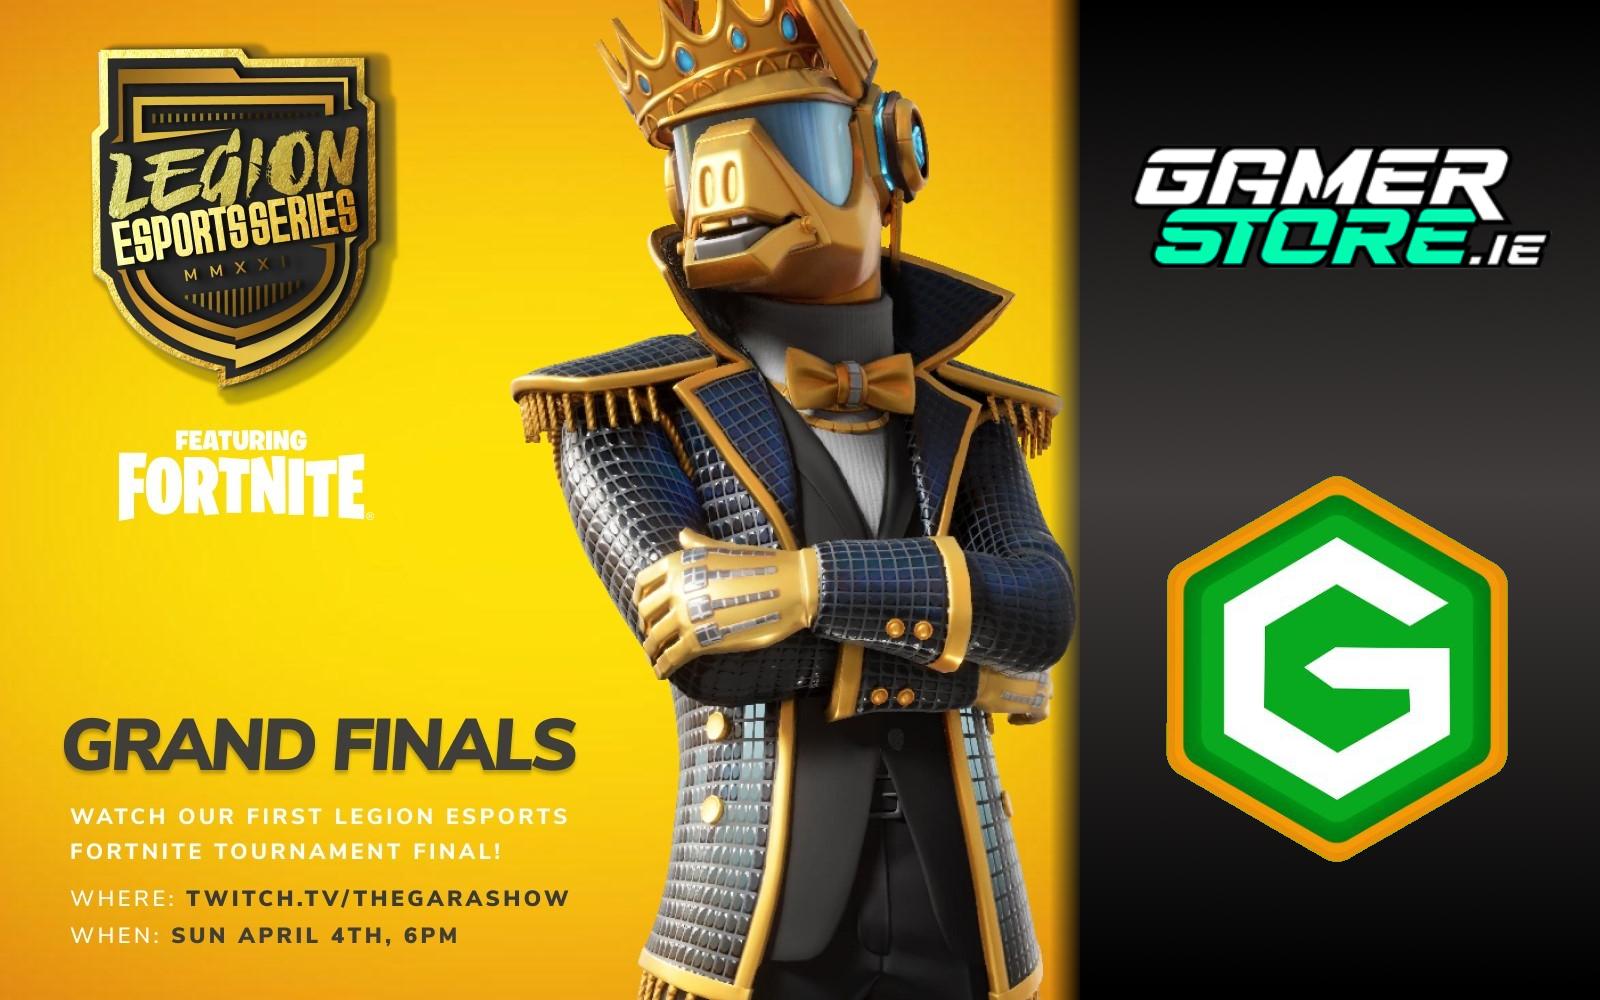 Legion eSports Series Fortnite Grand Final Happening Sunday April 4th